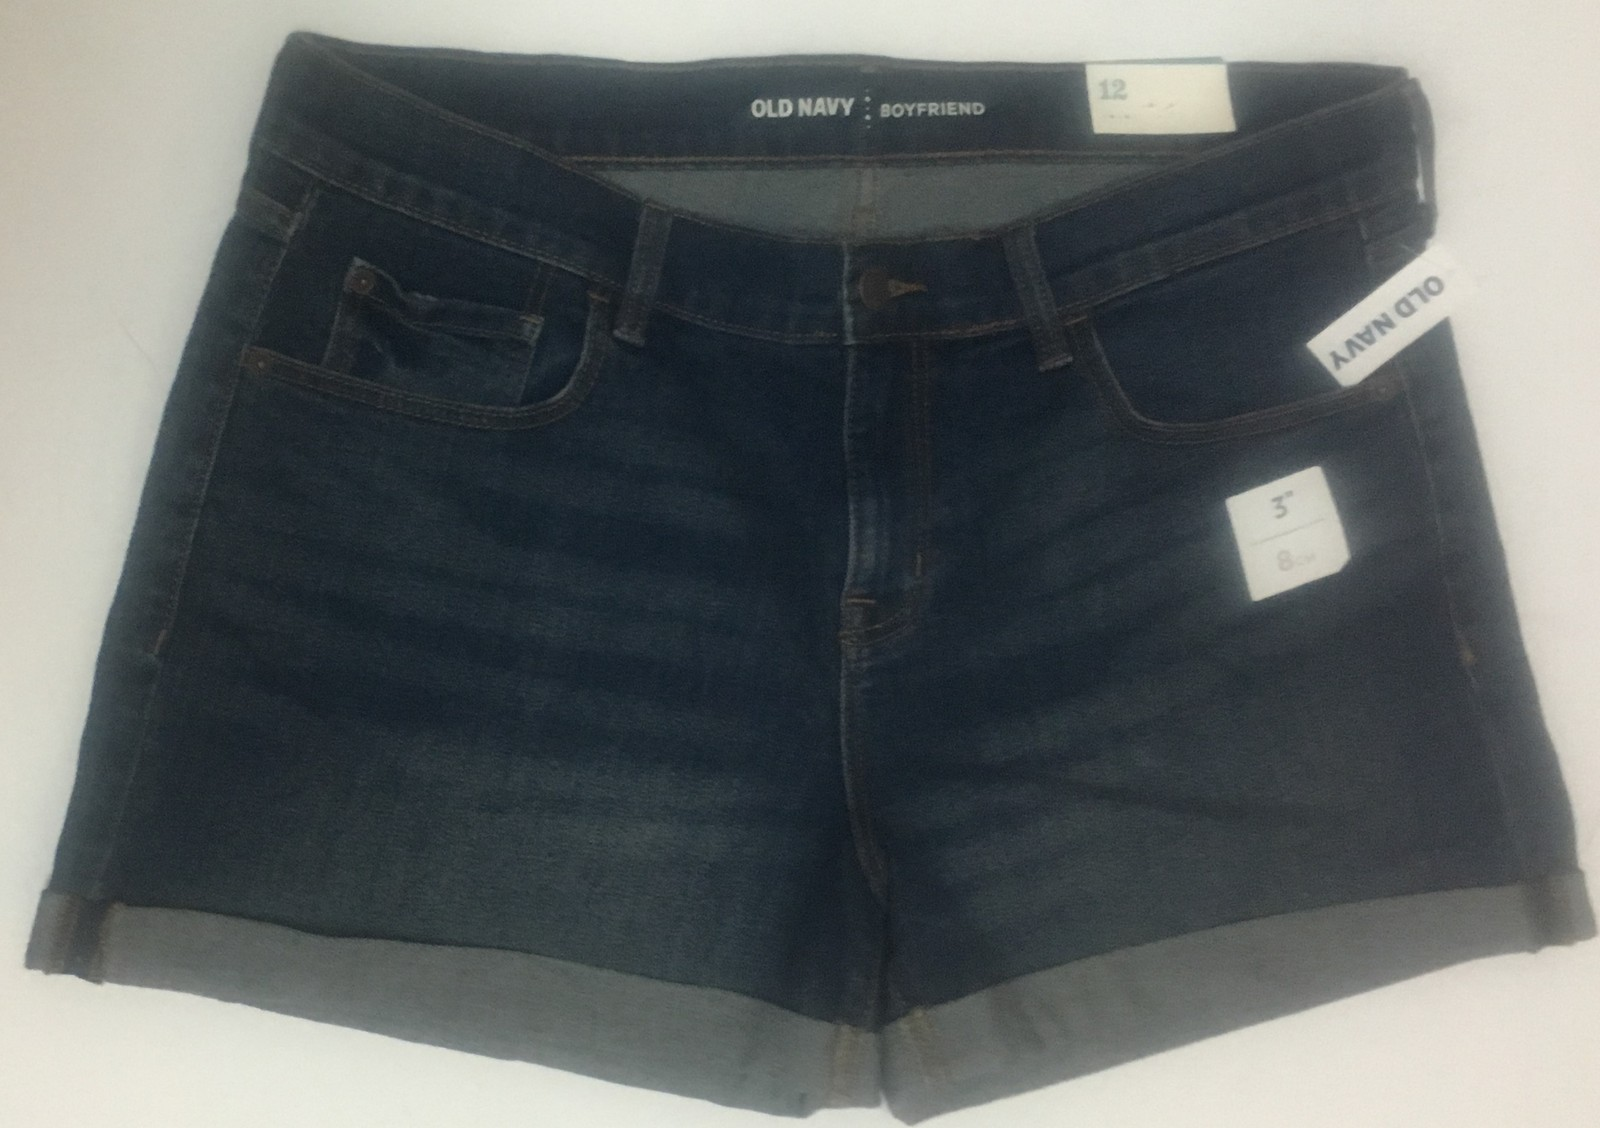 Old Navy Boyfriend Blue Jean Shorts Sz 12